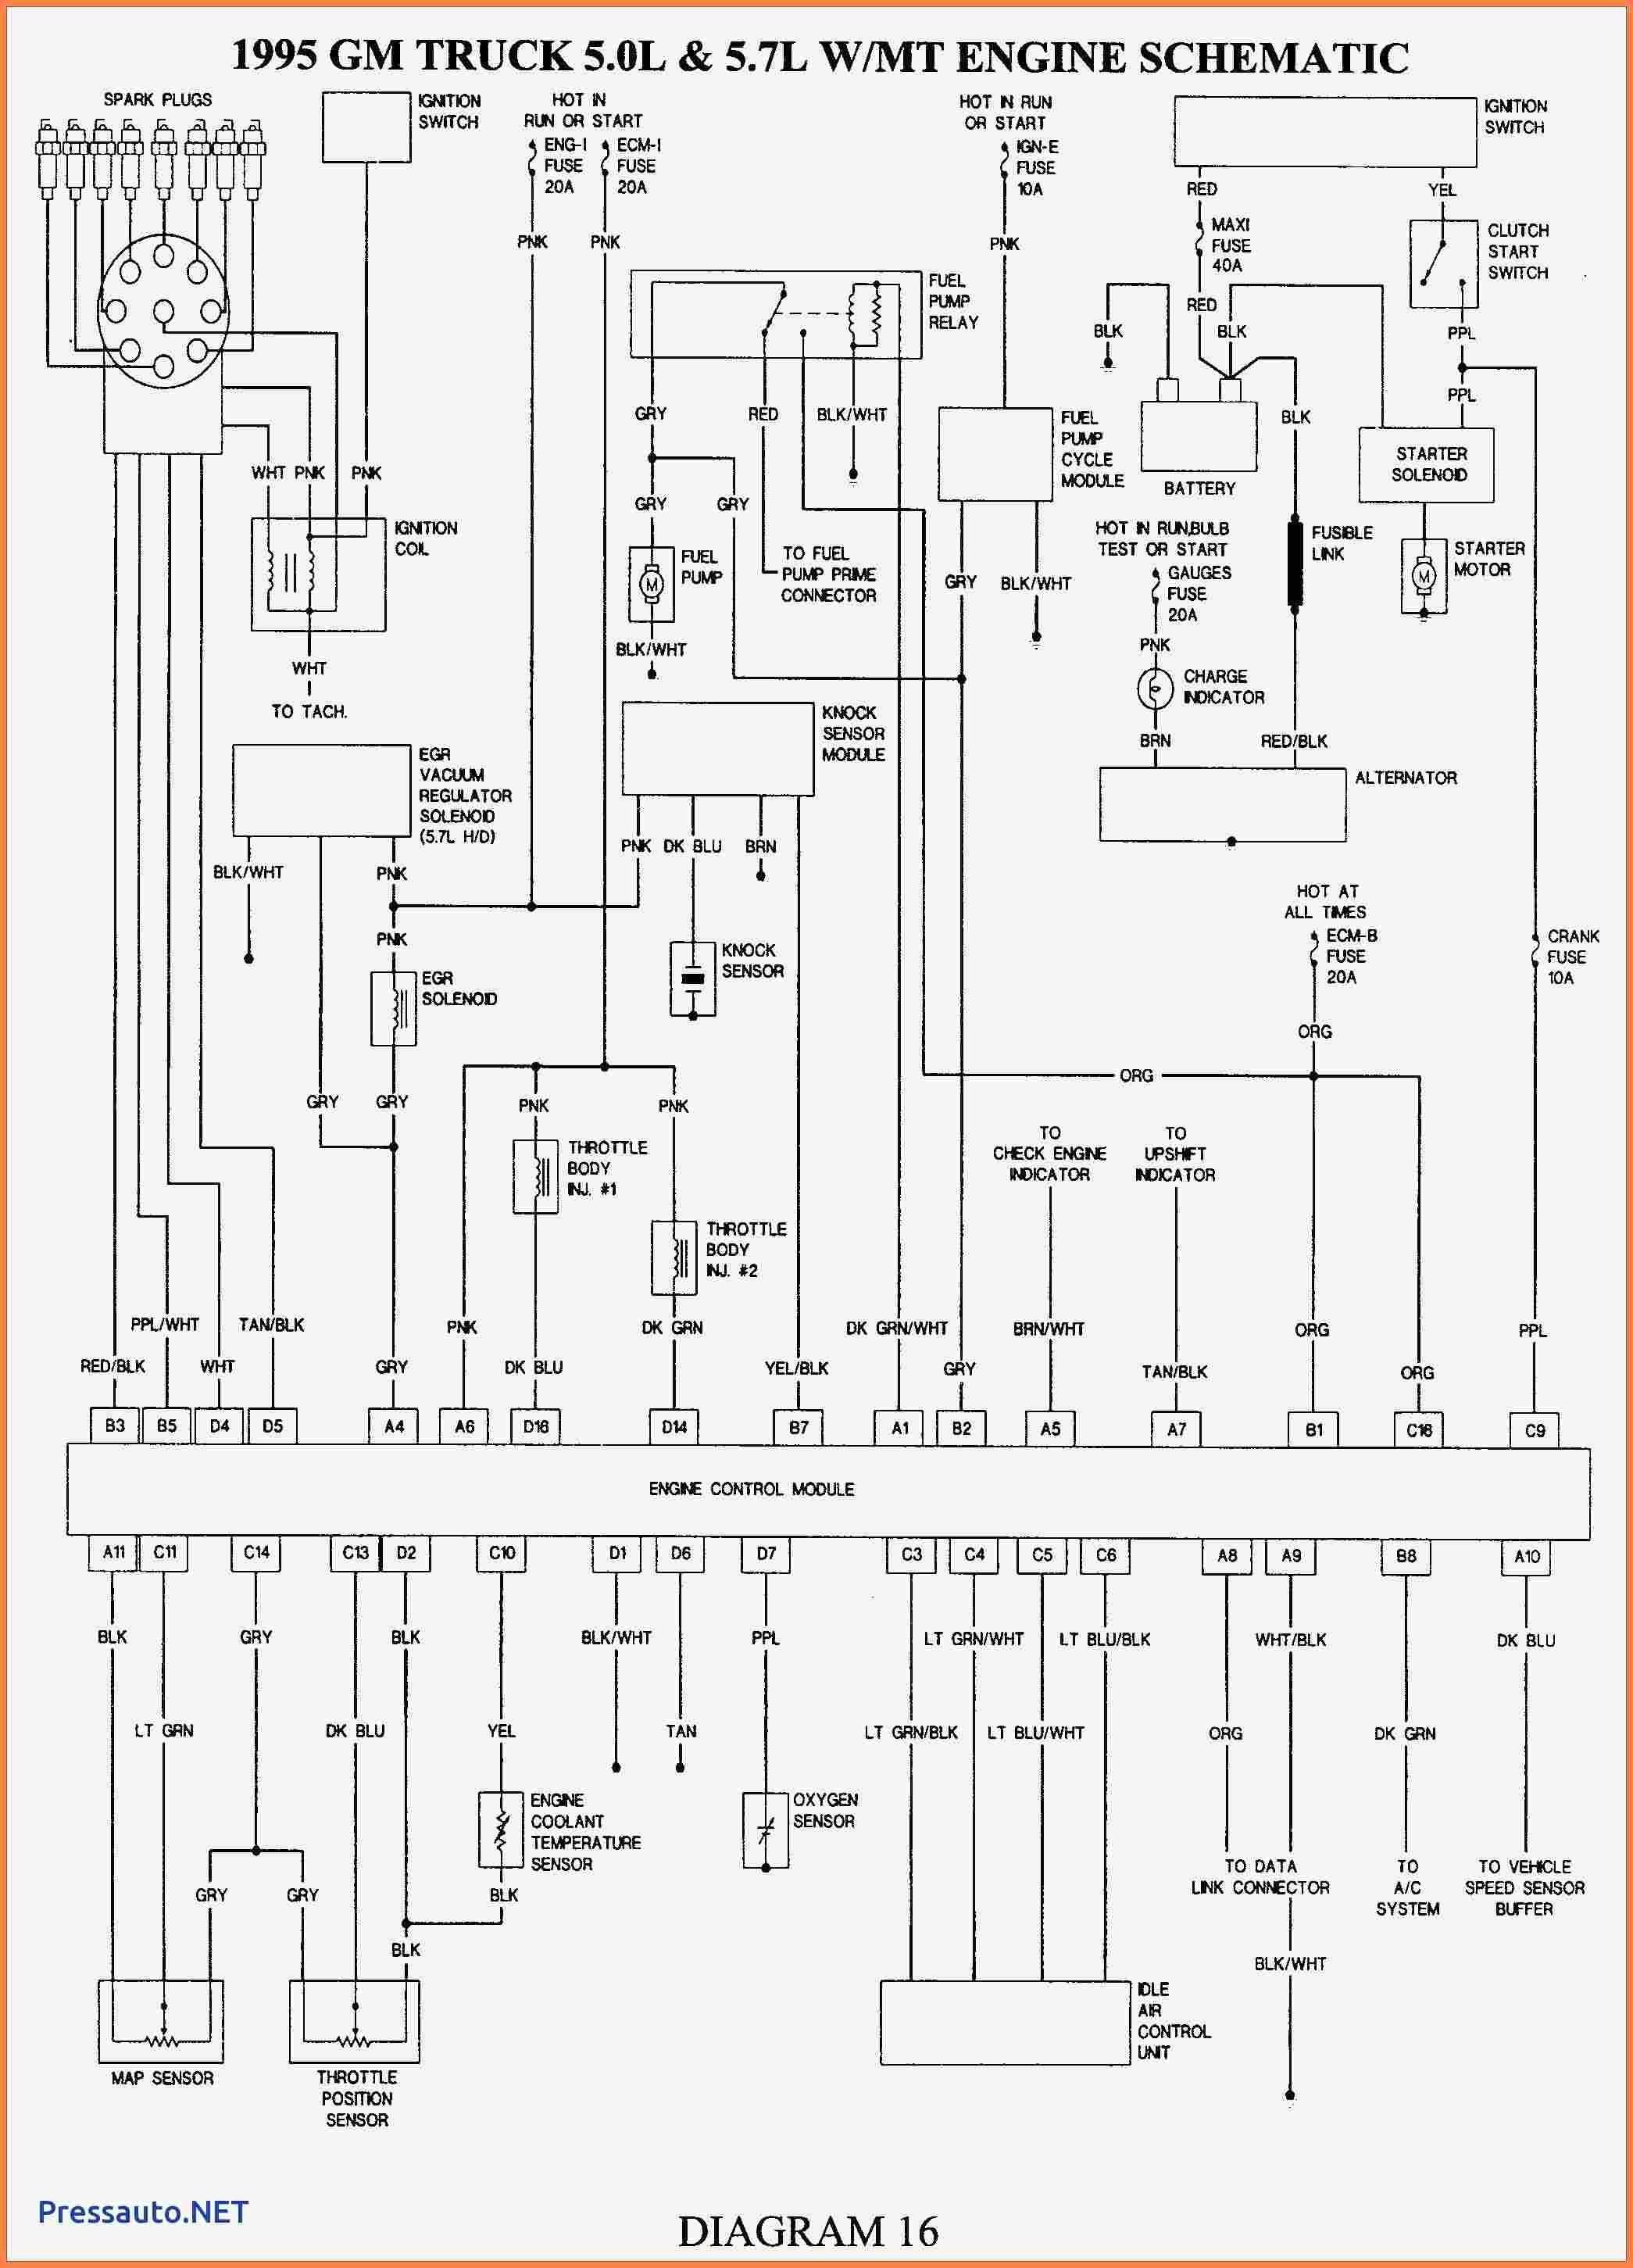 Brake Light Wiring Diagram 1994 Gmc Sierra 2005 Chevy 3500 Wiring Diagram Wiring Diagram Show Of Brake Light Wiring Diagram 1994 Gmc Sierra